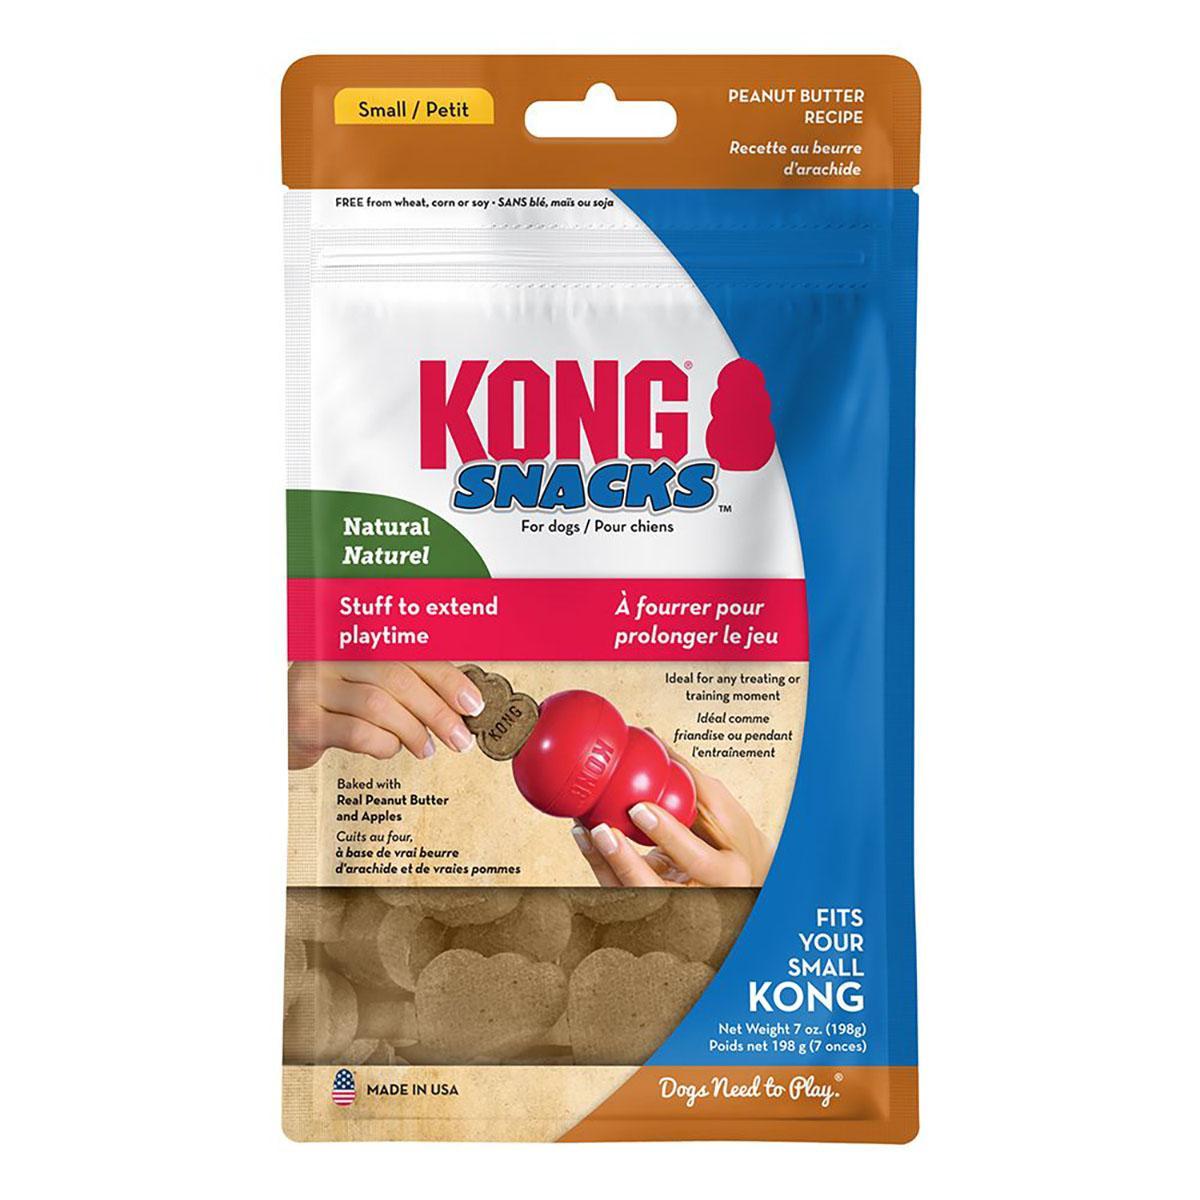 KONG Peanut Butter Snacks Dog Treats